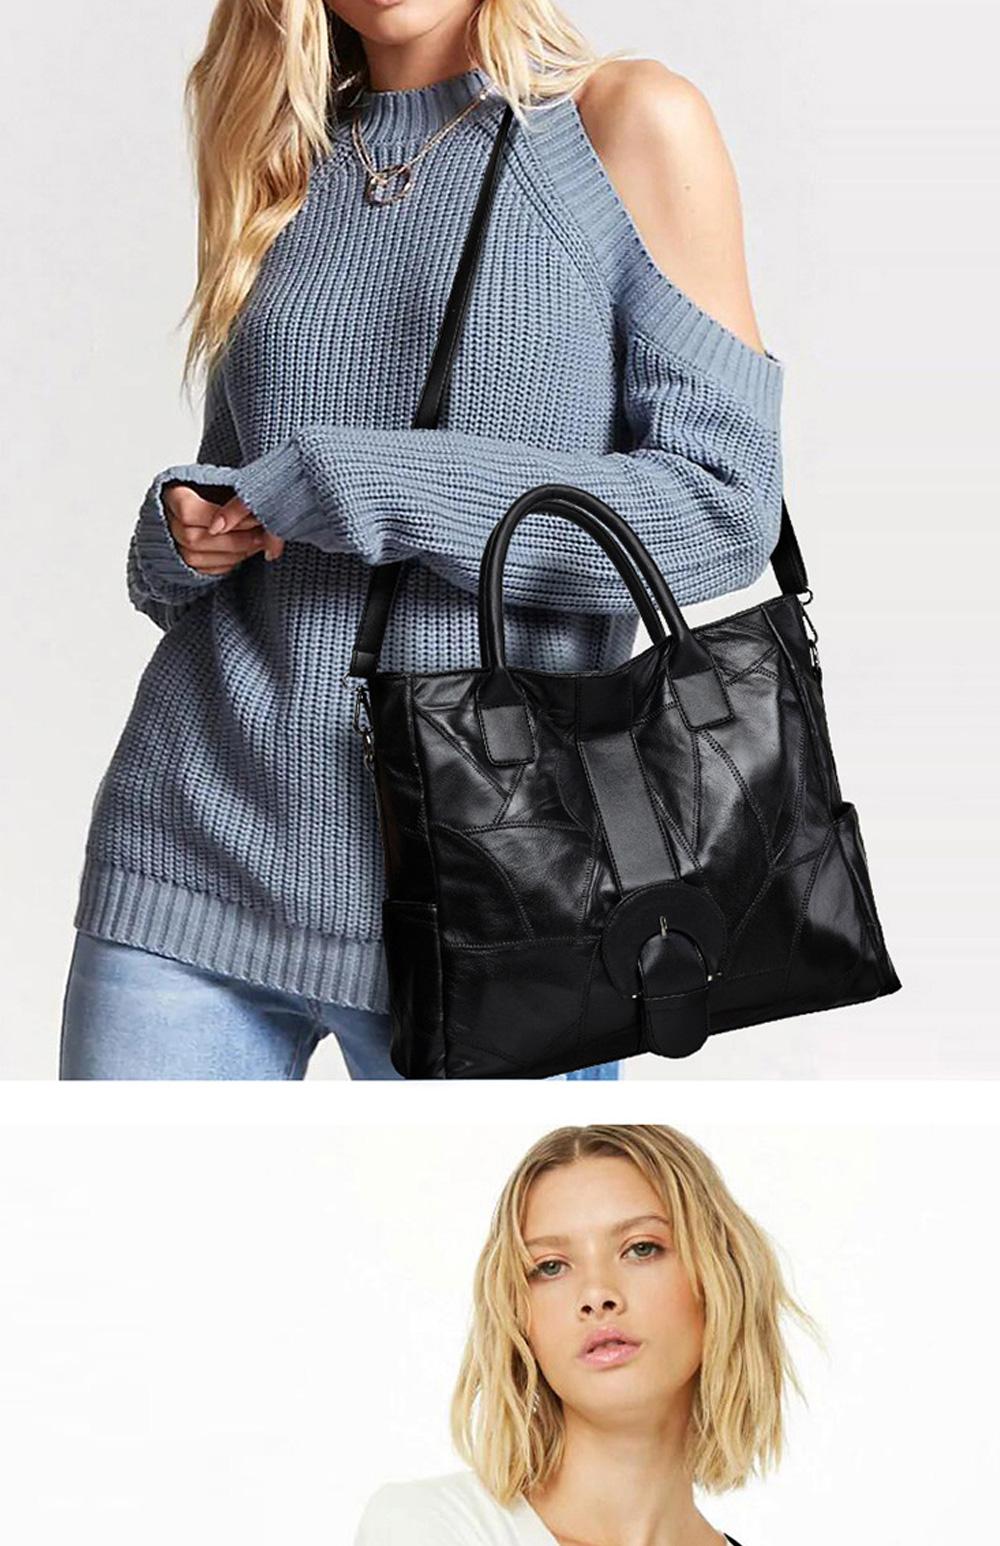 Genuine Leather Handbags Sheepskin Tote Bags, New Large-capacity Shoulder Handbags, Mommy bags Designed for women 33*10*31cm 2